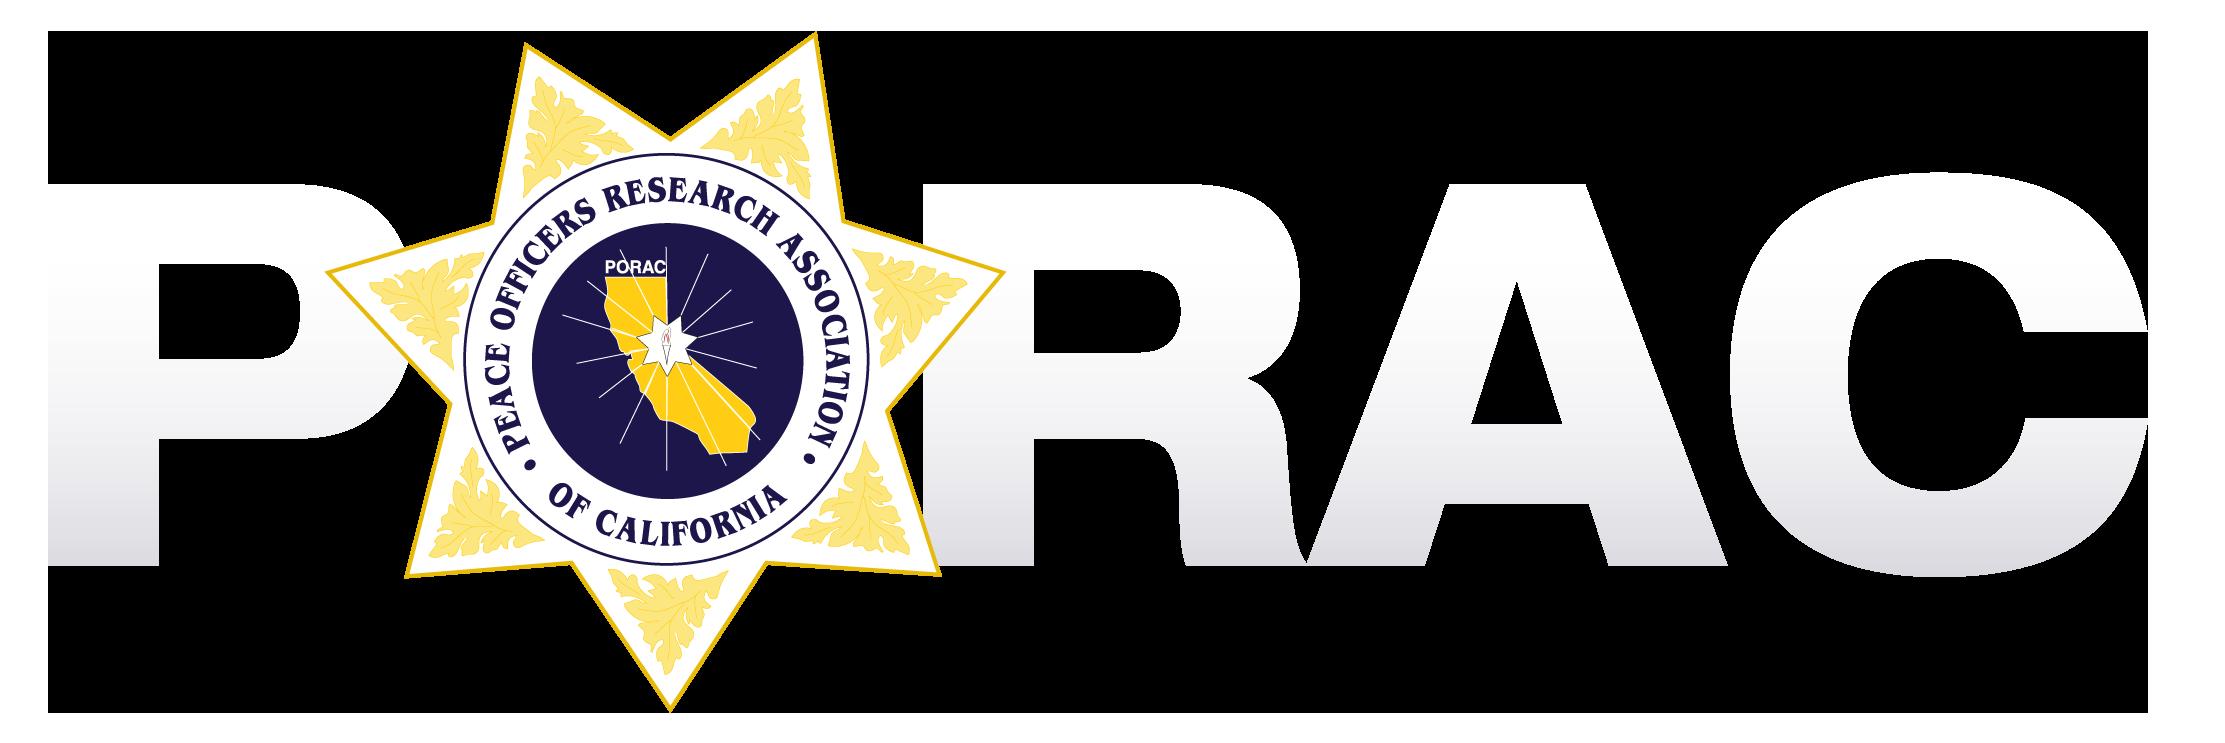 PORAC Logo